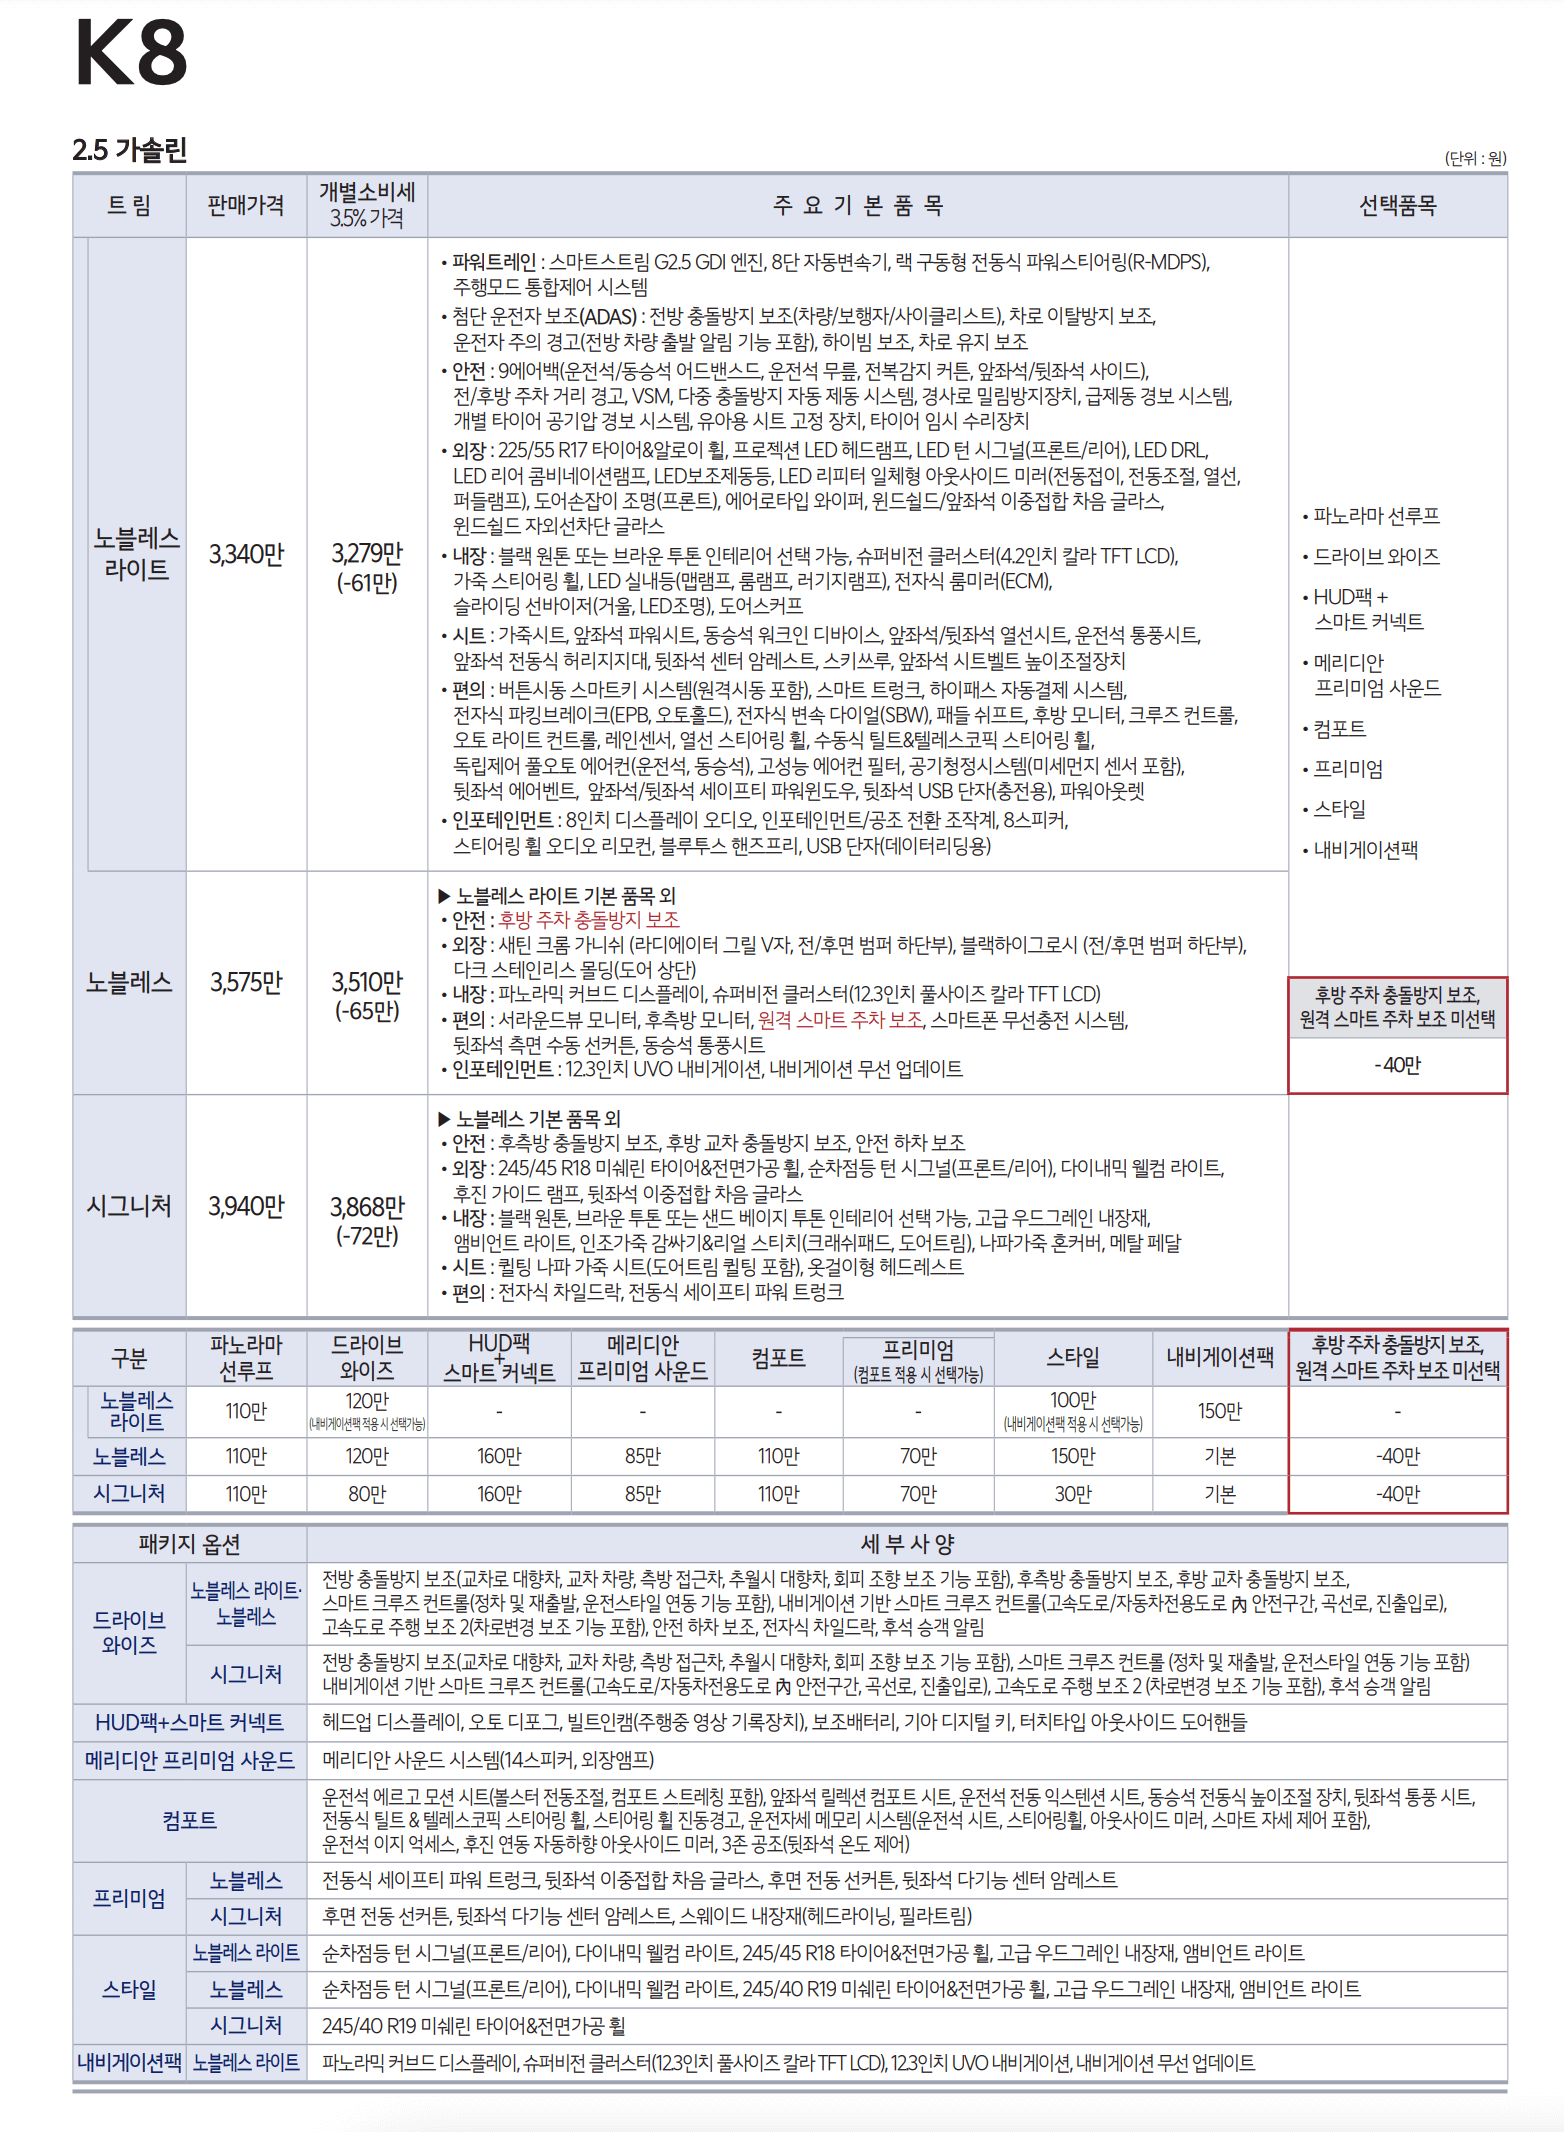 K8-가솔린-2.5-가격표